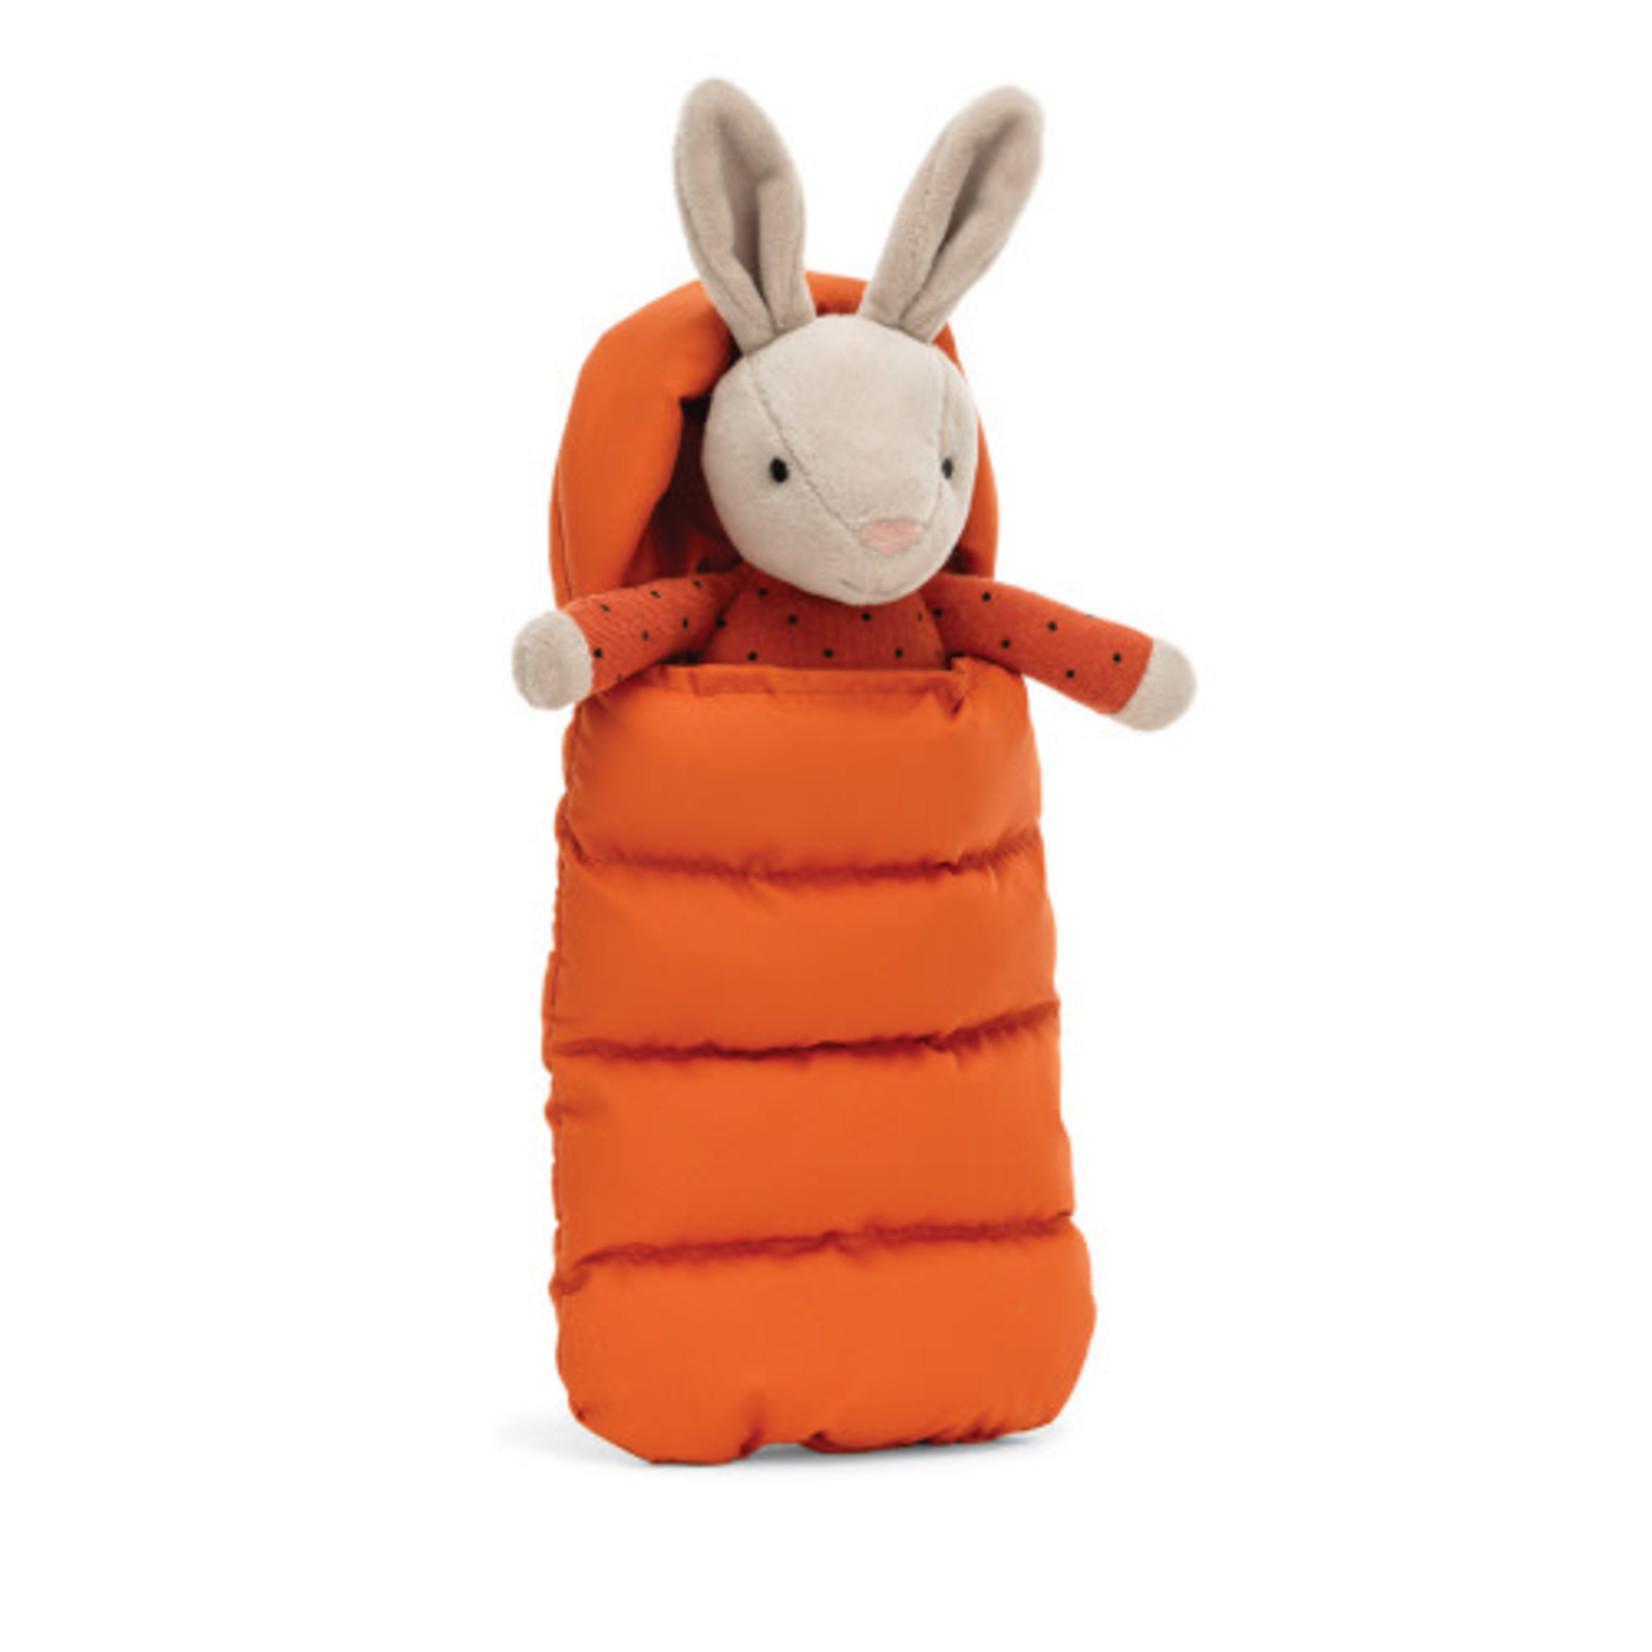 JELLYCAT Sleeping Bag Snuggler Bunny